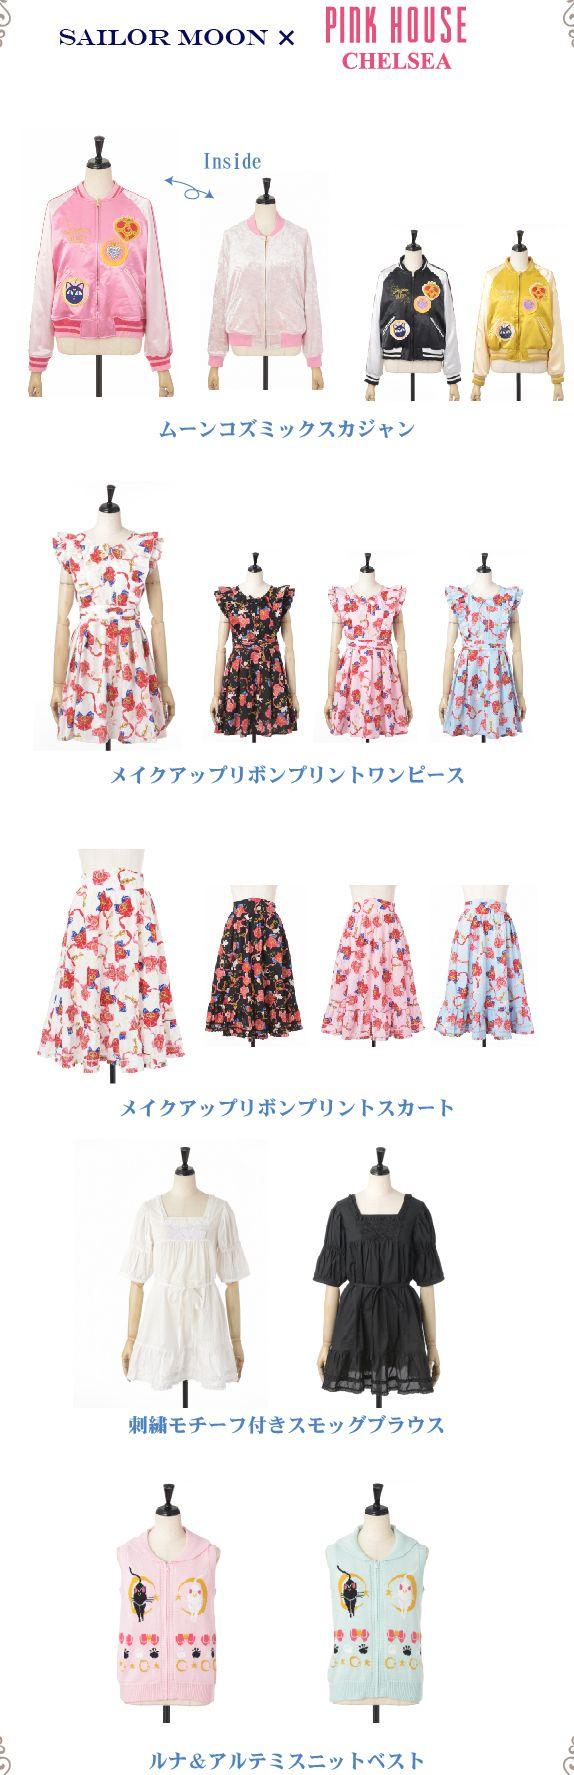 """sailor moon"" ""sailor moon merchandise"" ""sailor moon collaboration"" ""sailor moon apparel"" ""sailor moon clothes"" ""sailor moon dress"" ""sailor moon vest"" ""sailor moon jacket"" ""pink house chelsea"" isetan shop anime japan 2016 tote bag pouch ""cosmic heart"" ""prism heart"" compact"